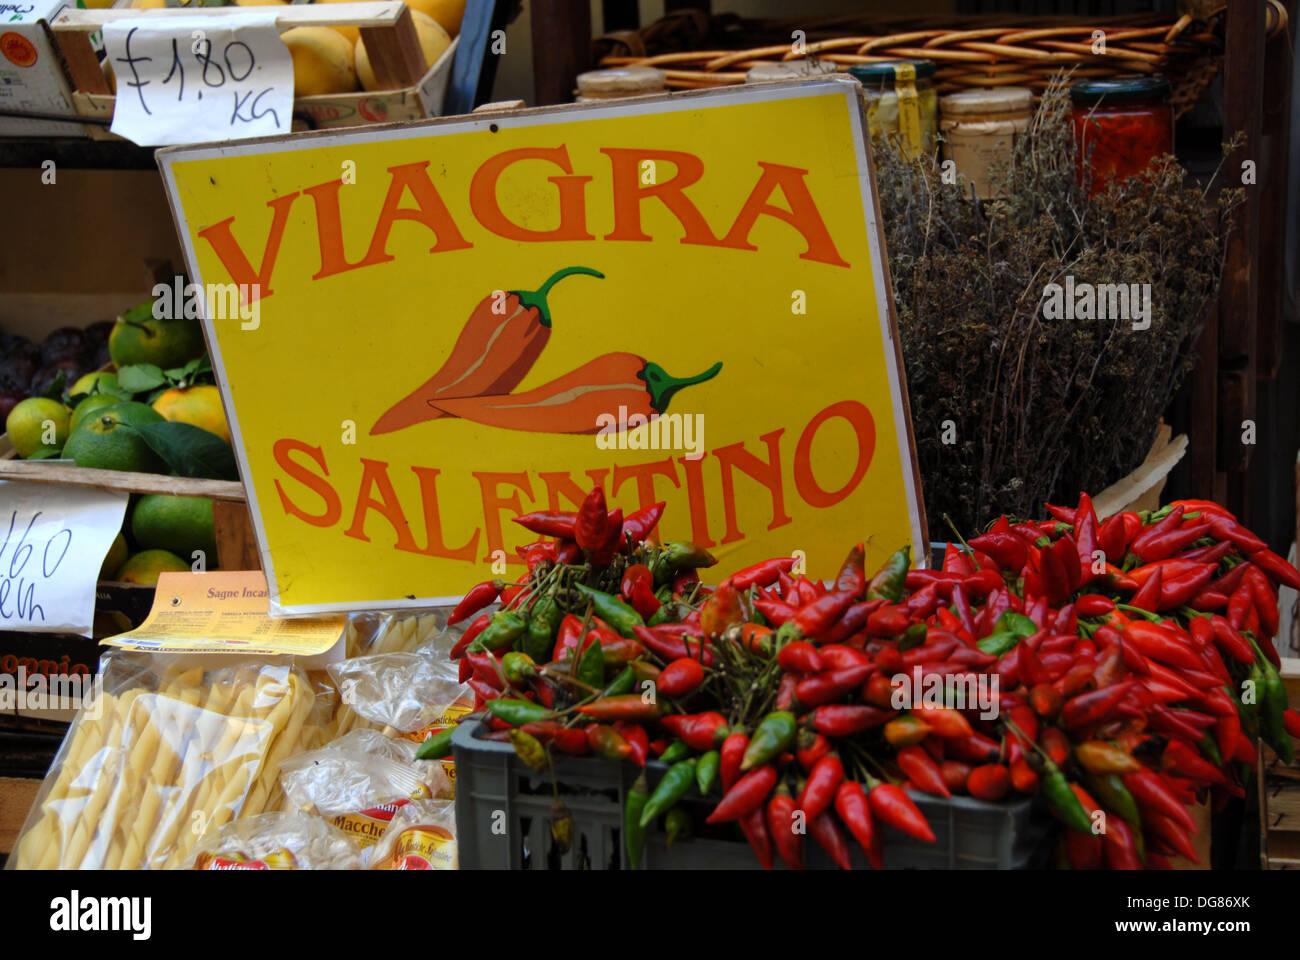 Viagra Stock Photos & Viagra Stock Images - Alamy